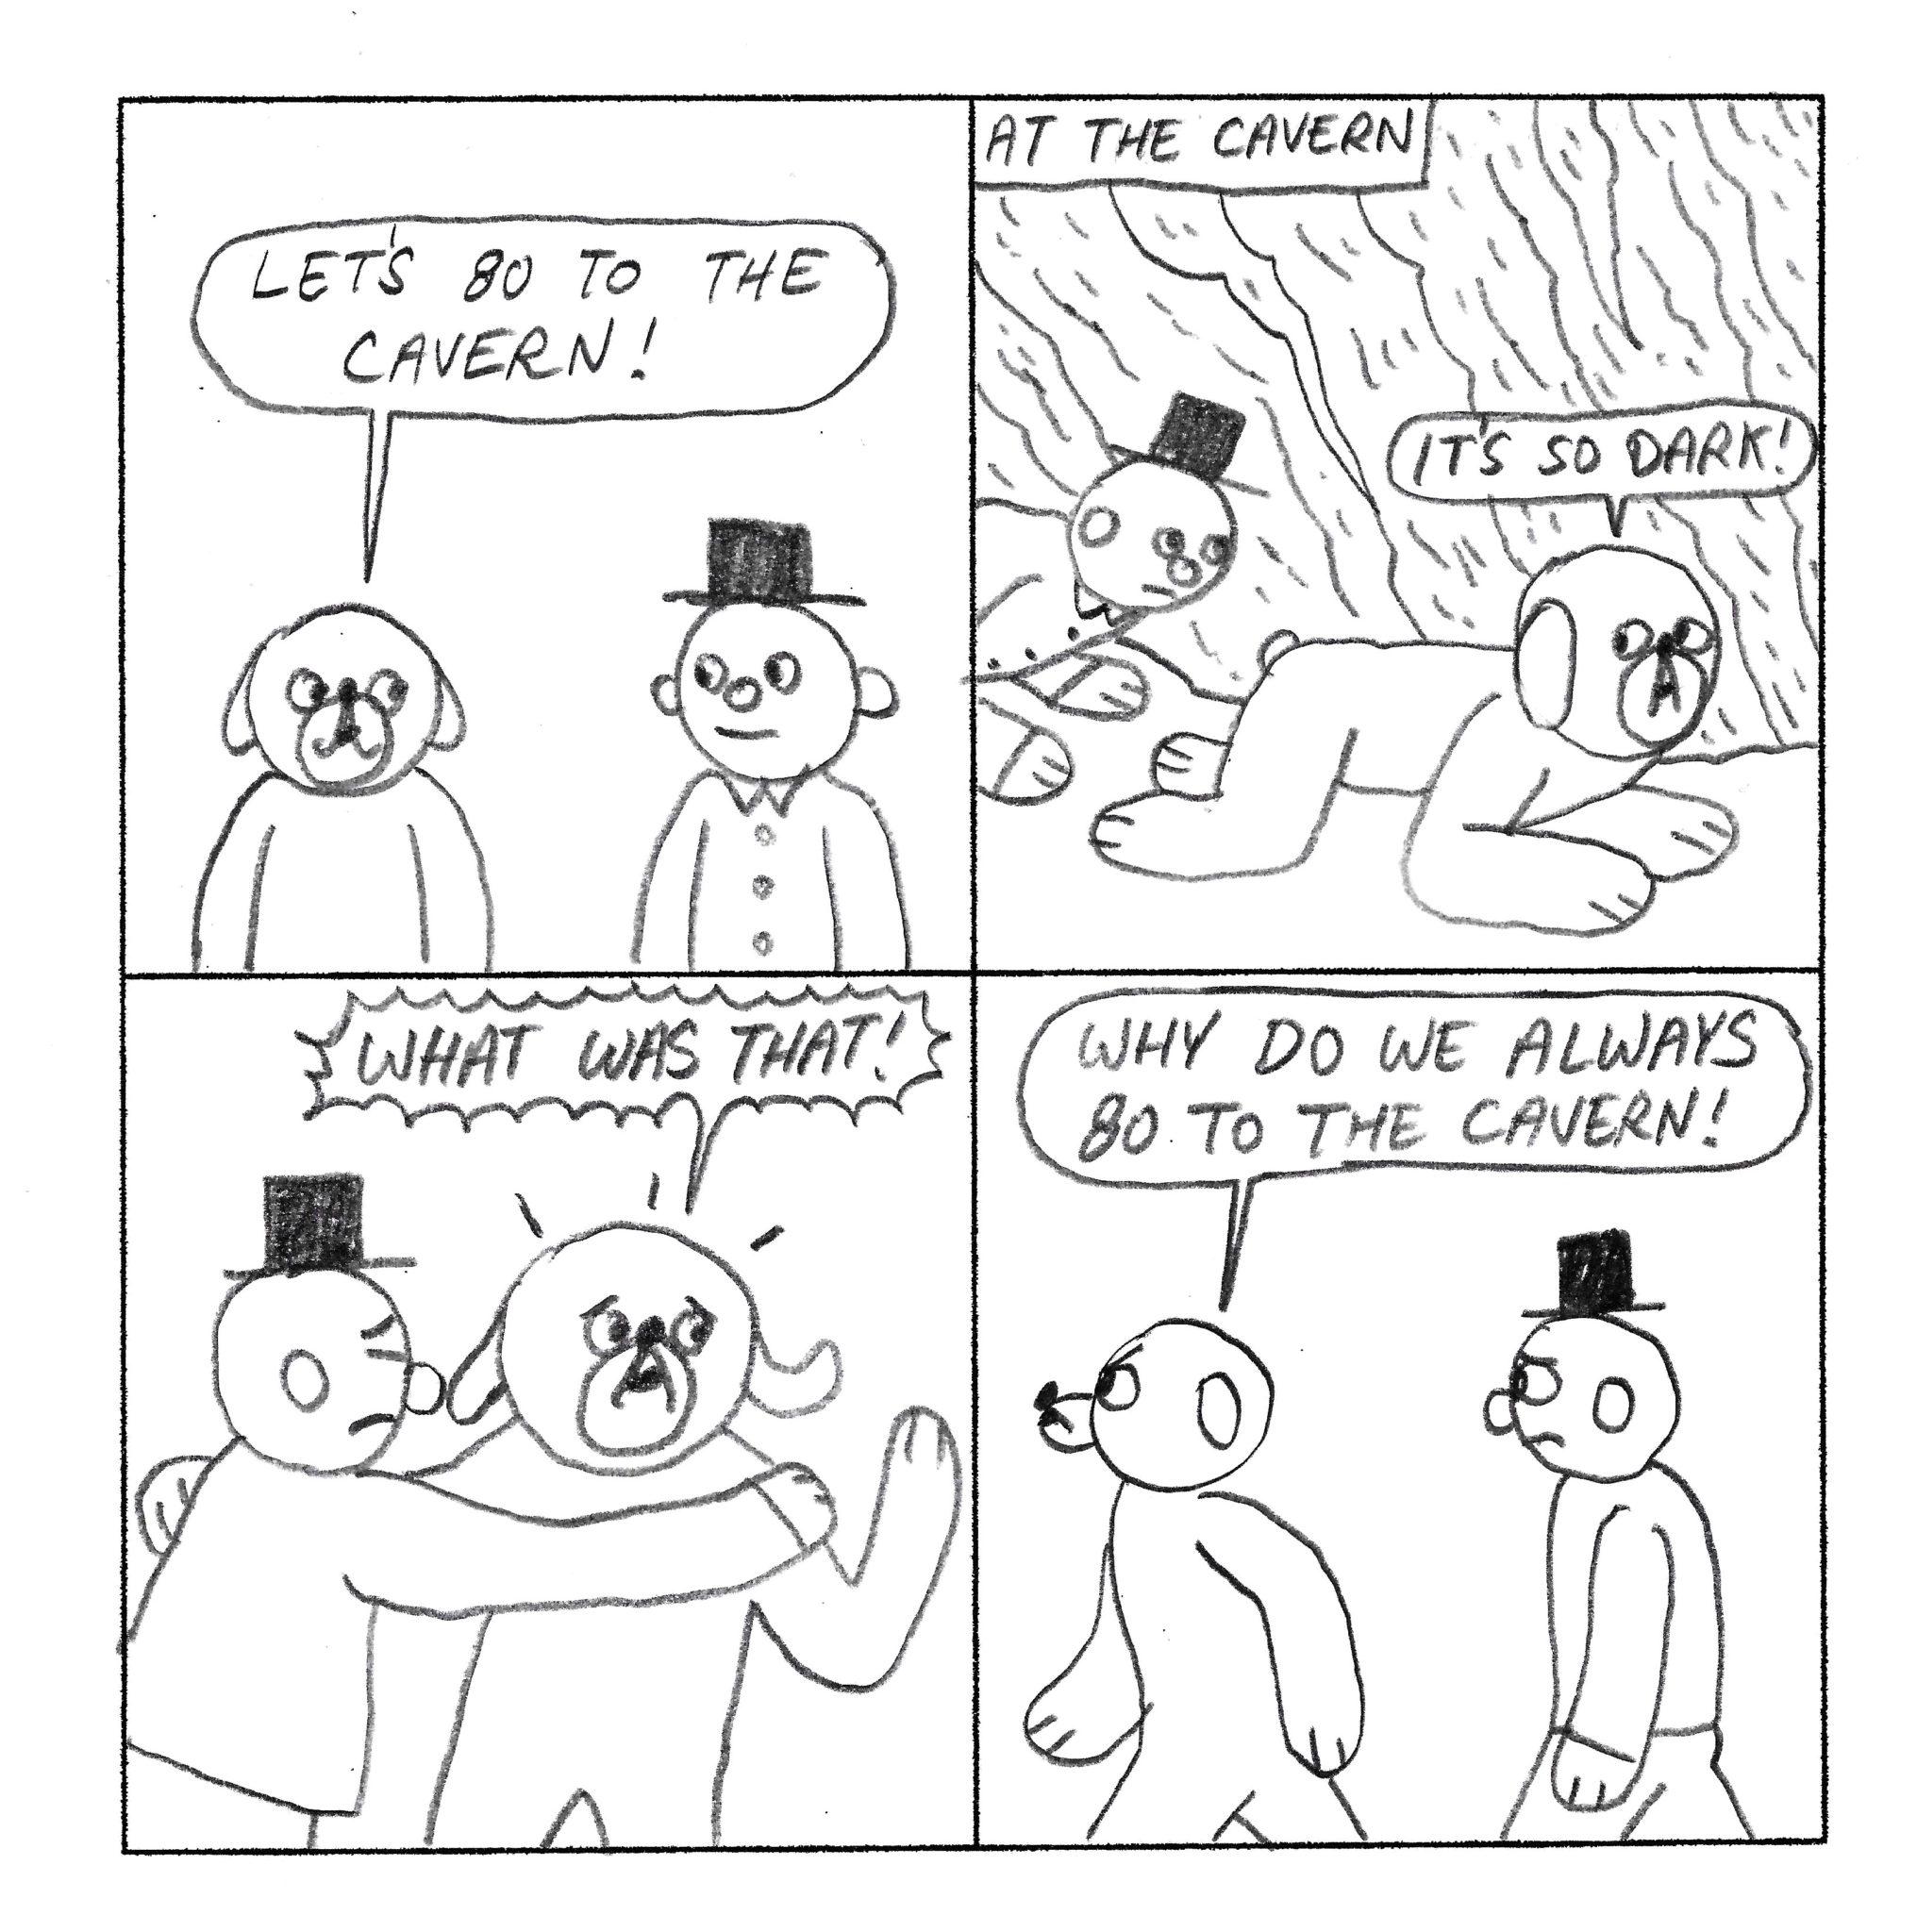 Dog Comics 61-70 - Page 1